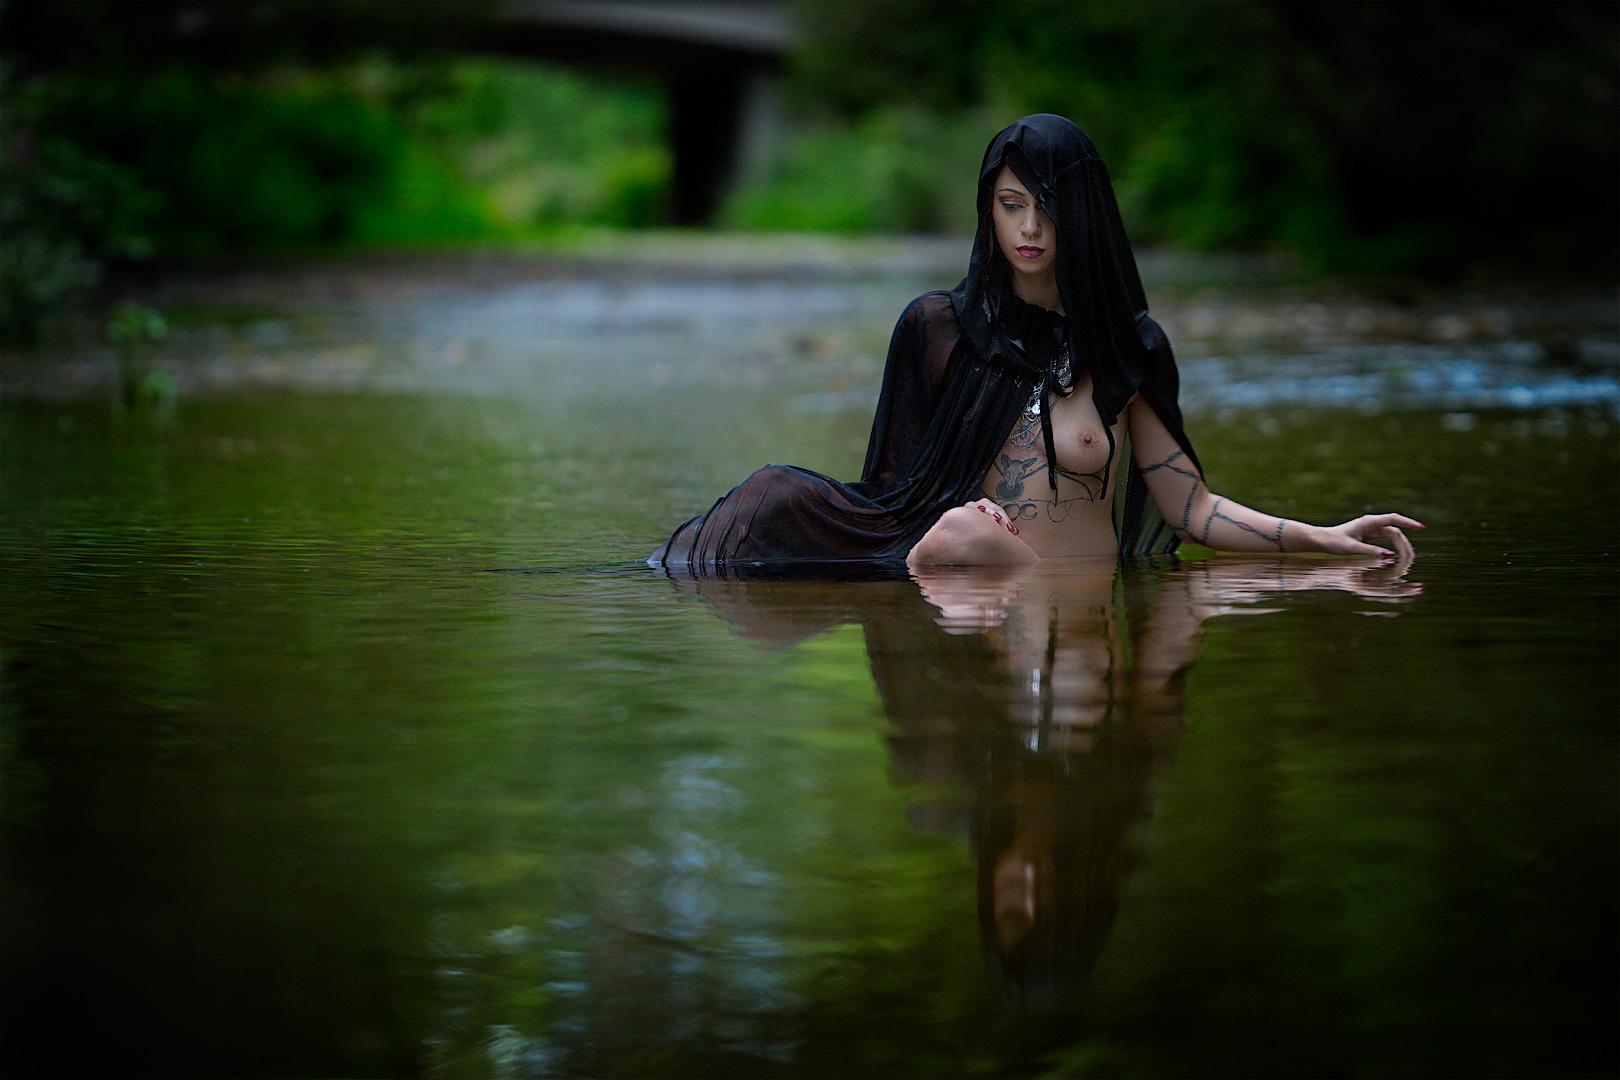 Fine Art Nude | Aqua Femina